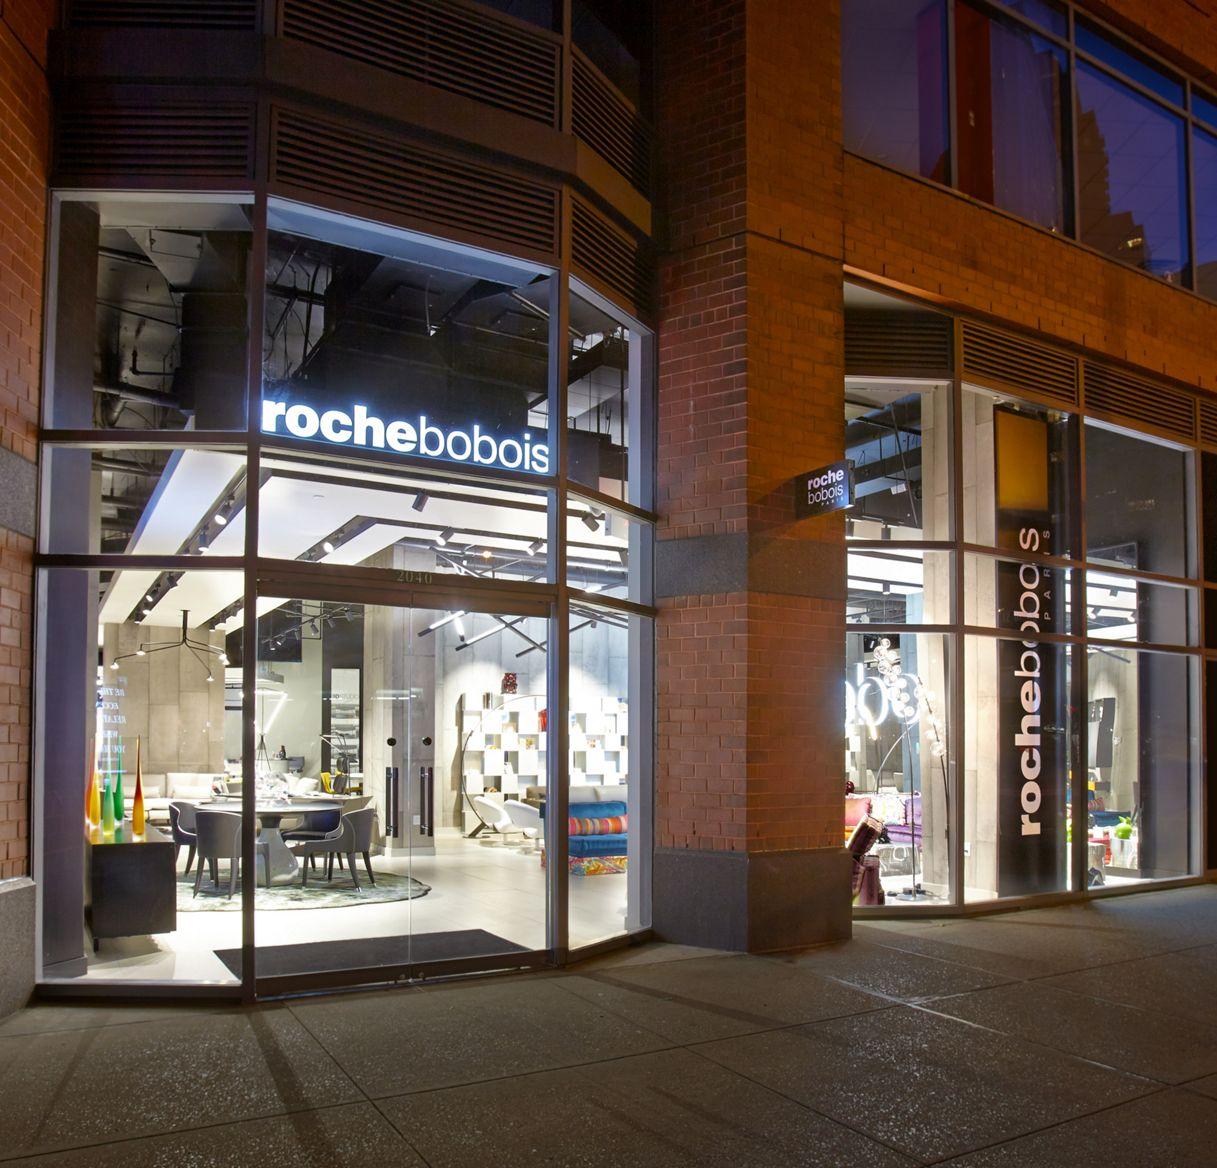 magasin roche bobois ny new york upper west side ny. Black Bedroom Furniture Sets. Home Design Ideas